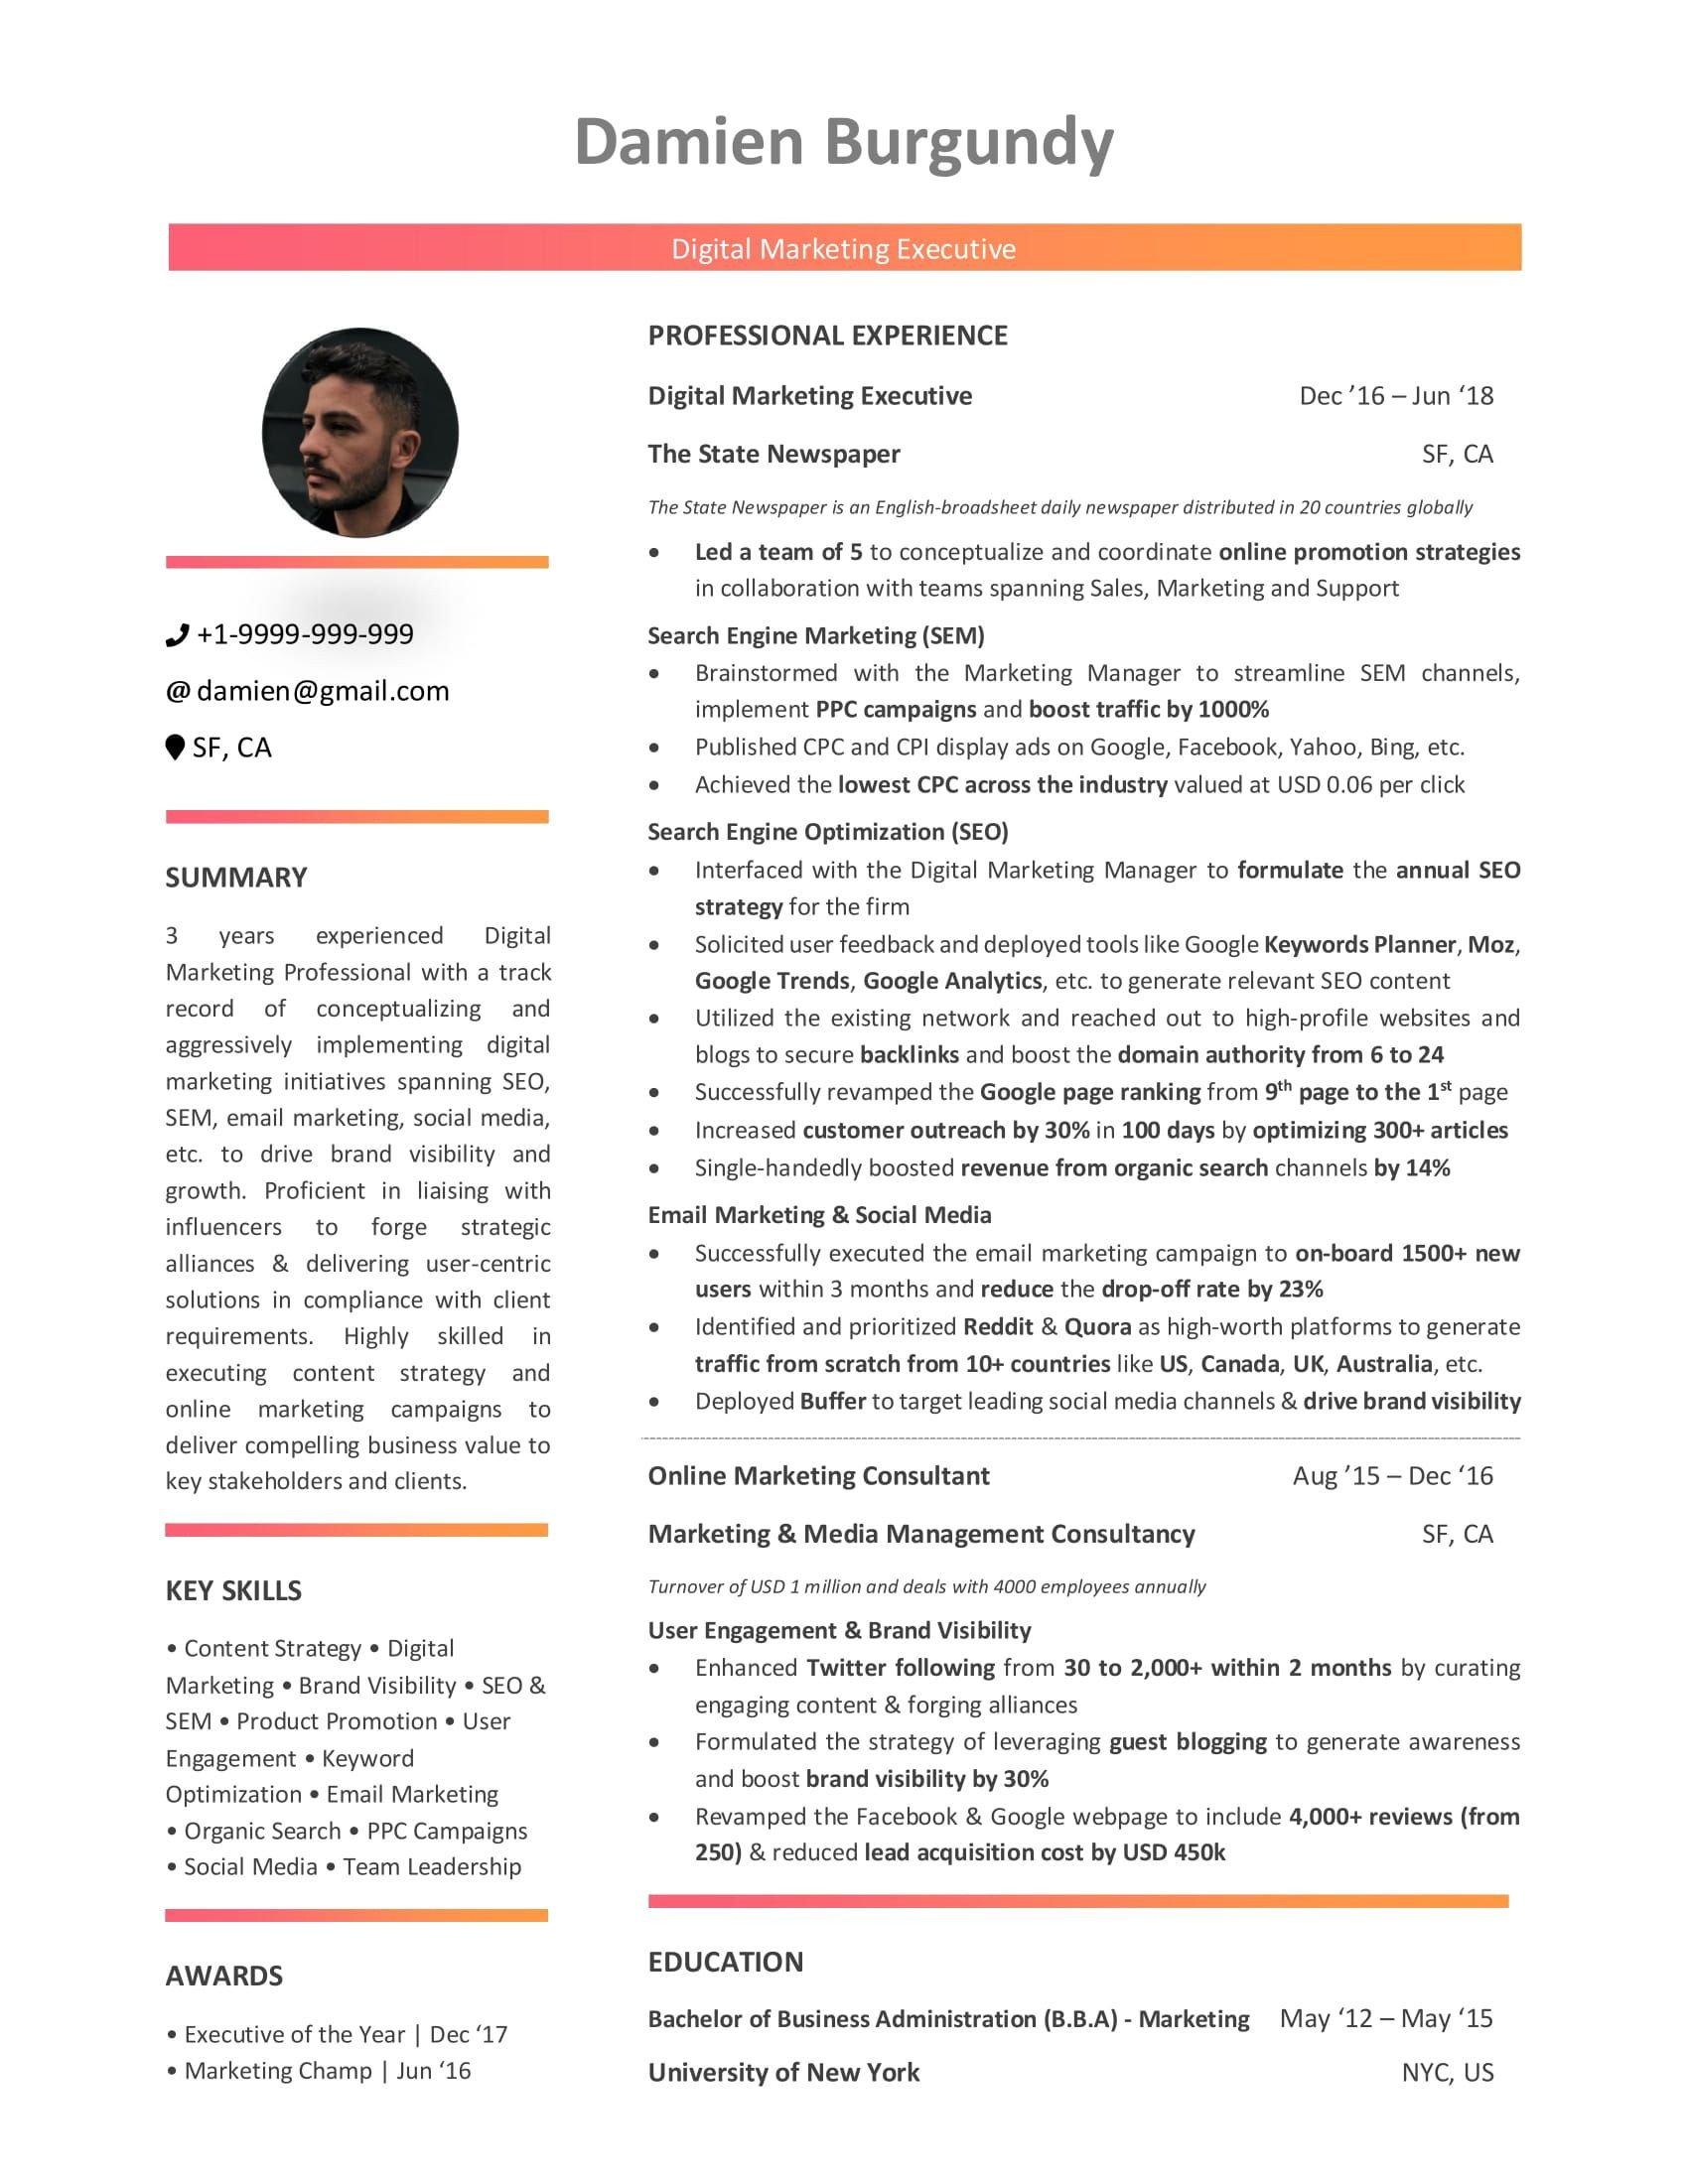 Entry Level Marketing Resume Digital Marketing Resume 10 Step Beginner S Guide [with